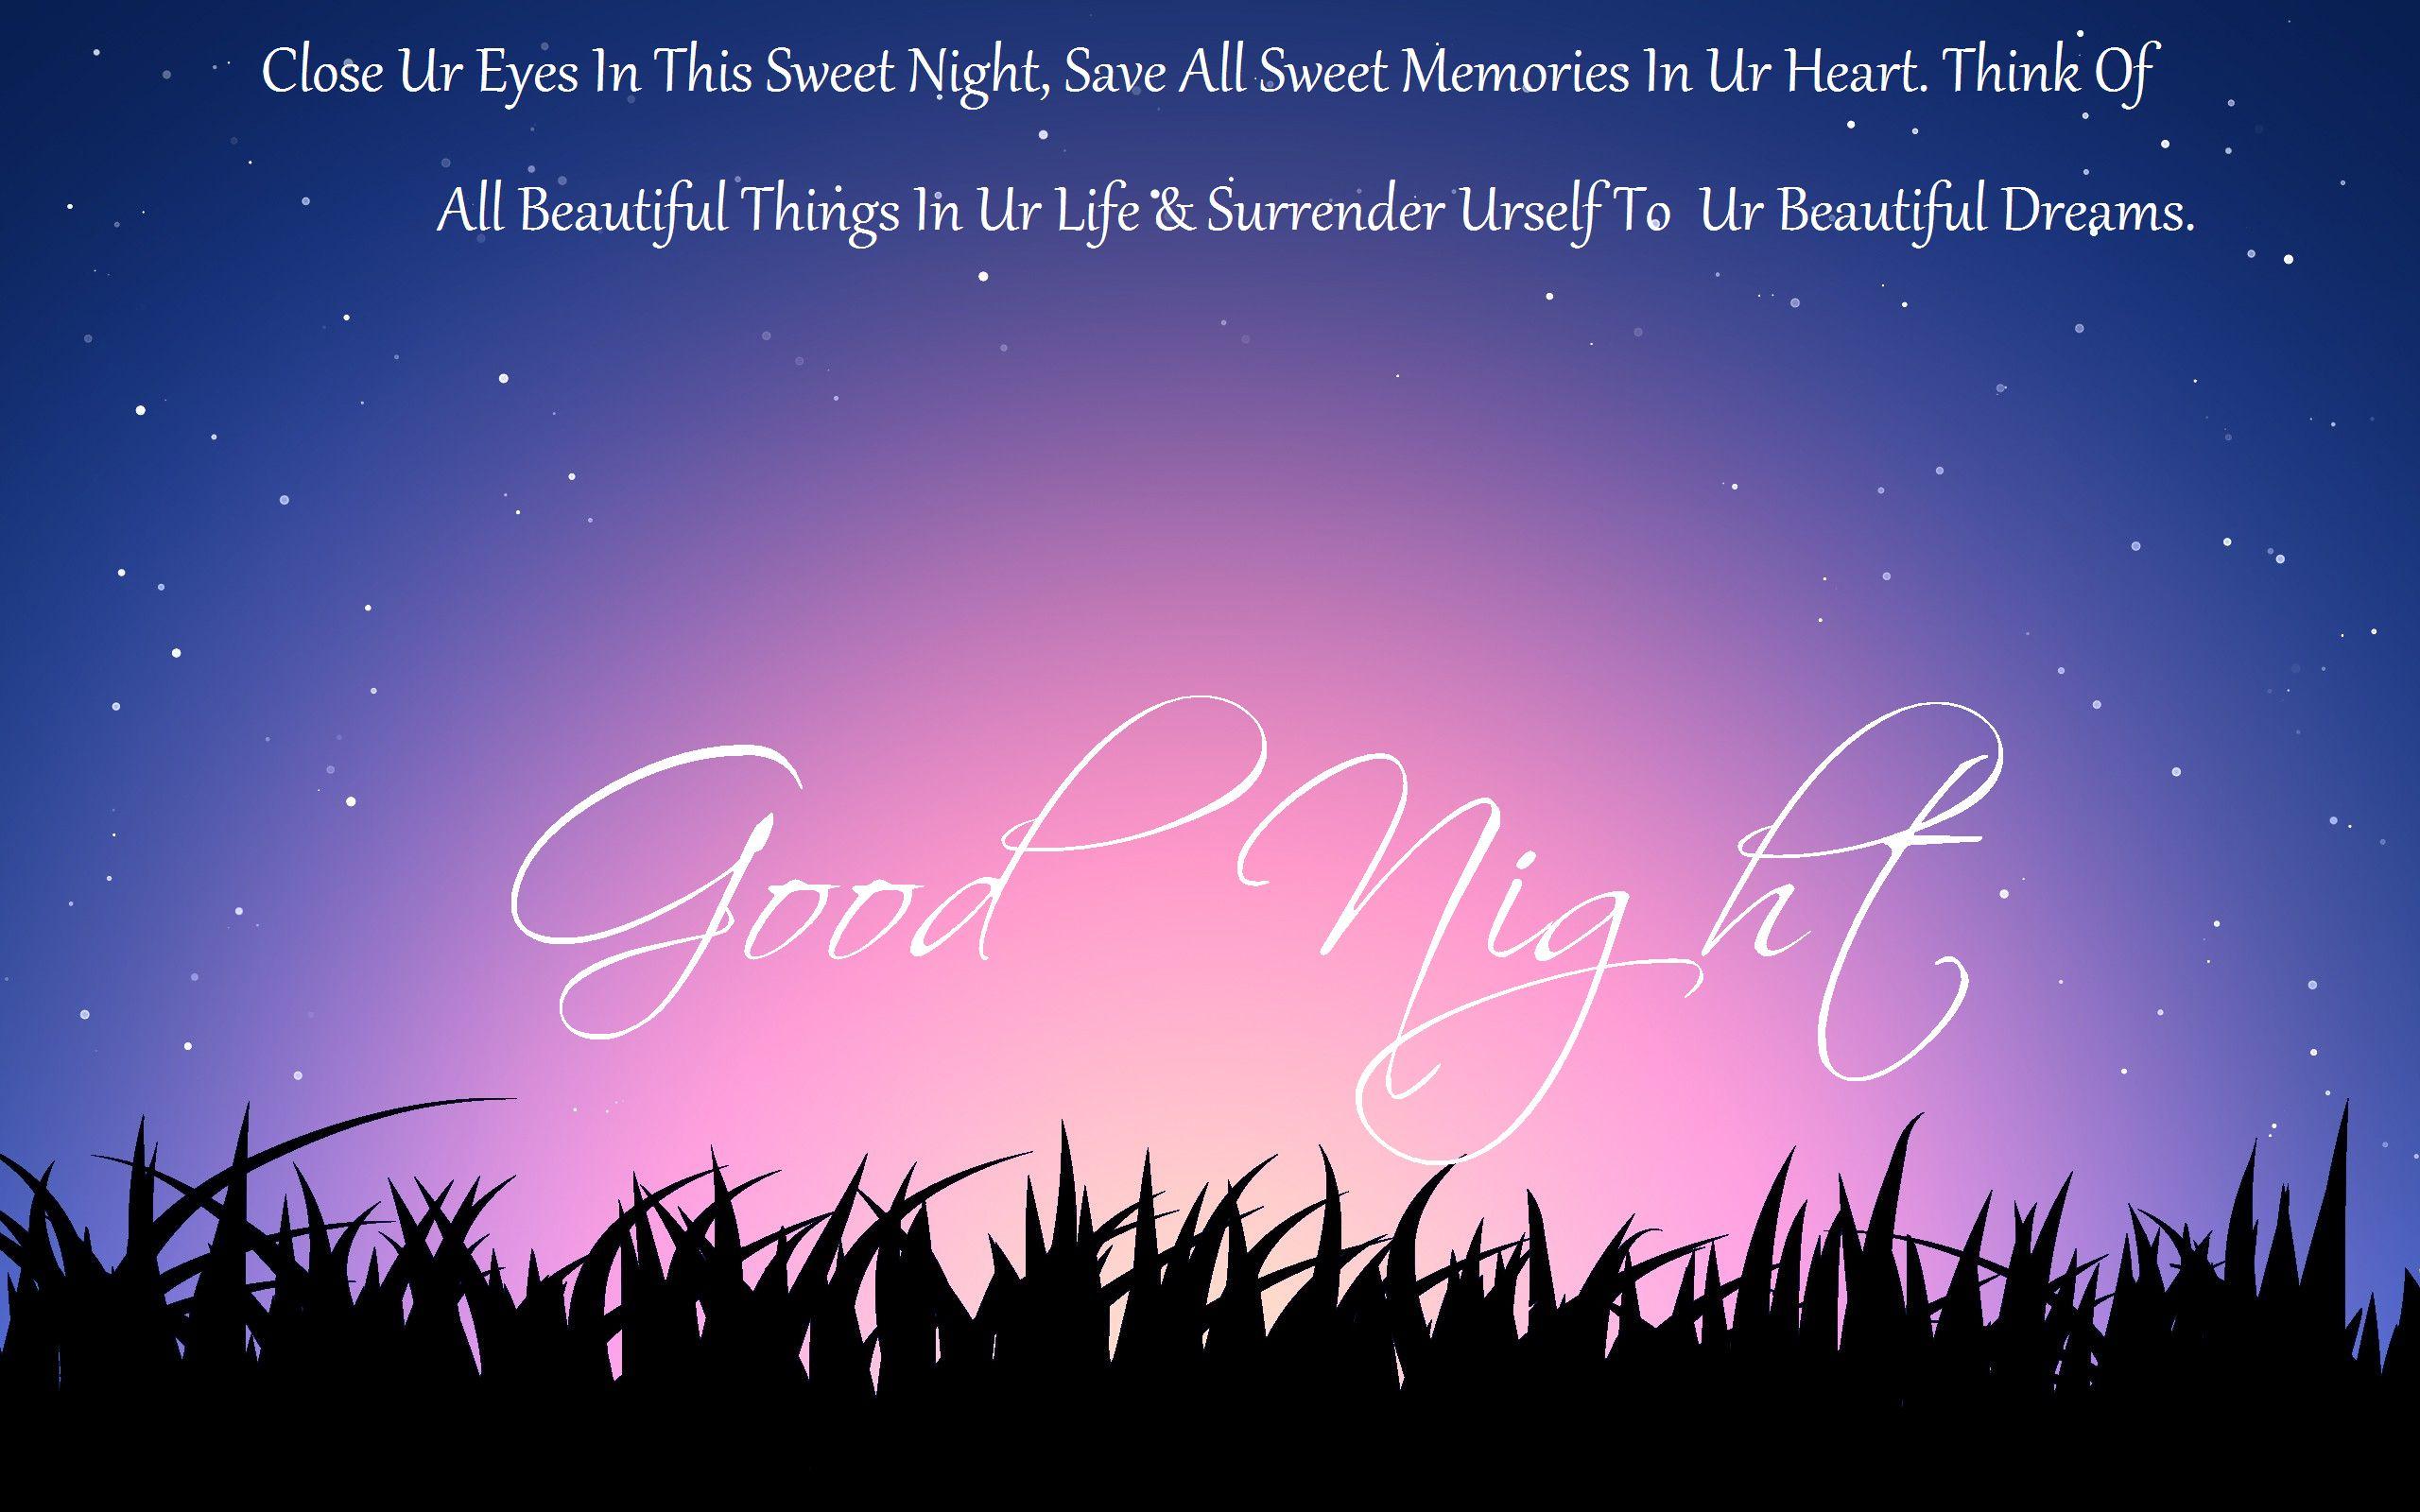 Good Night Quotes 1080p Wallpaper Good Night Wallpaper Cute Good Night Romantic Good Night Sweet dreams good night images hd 1080p